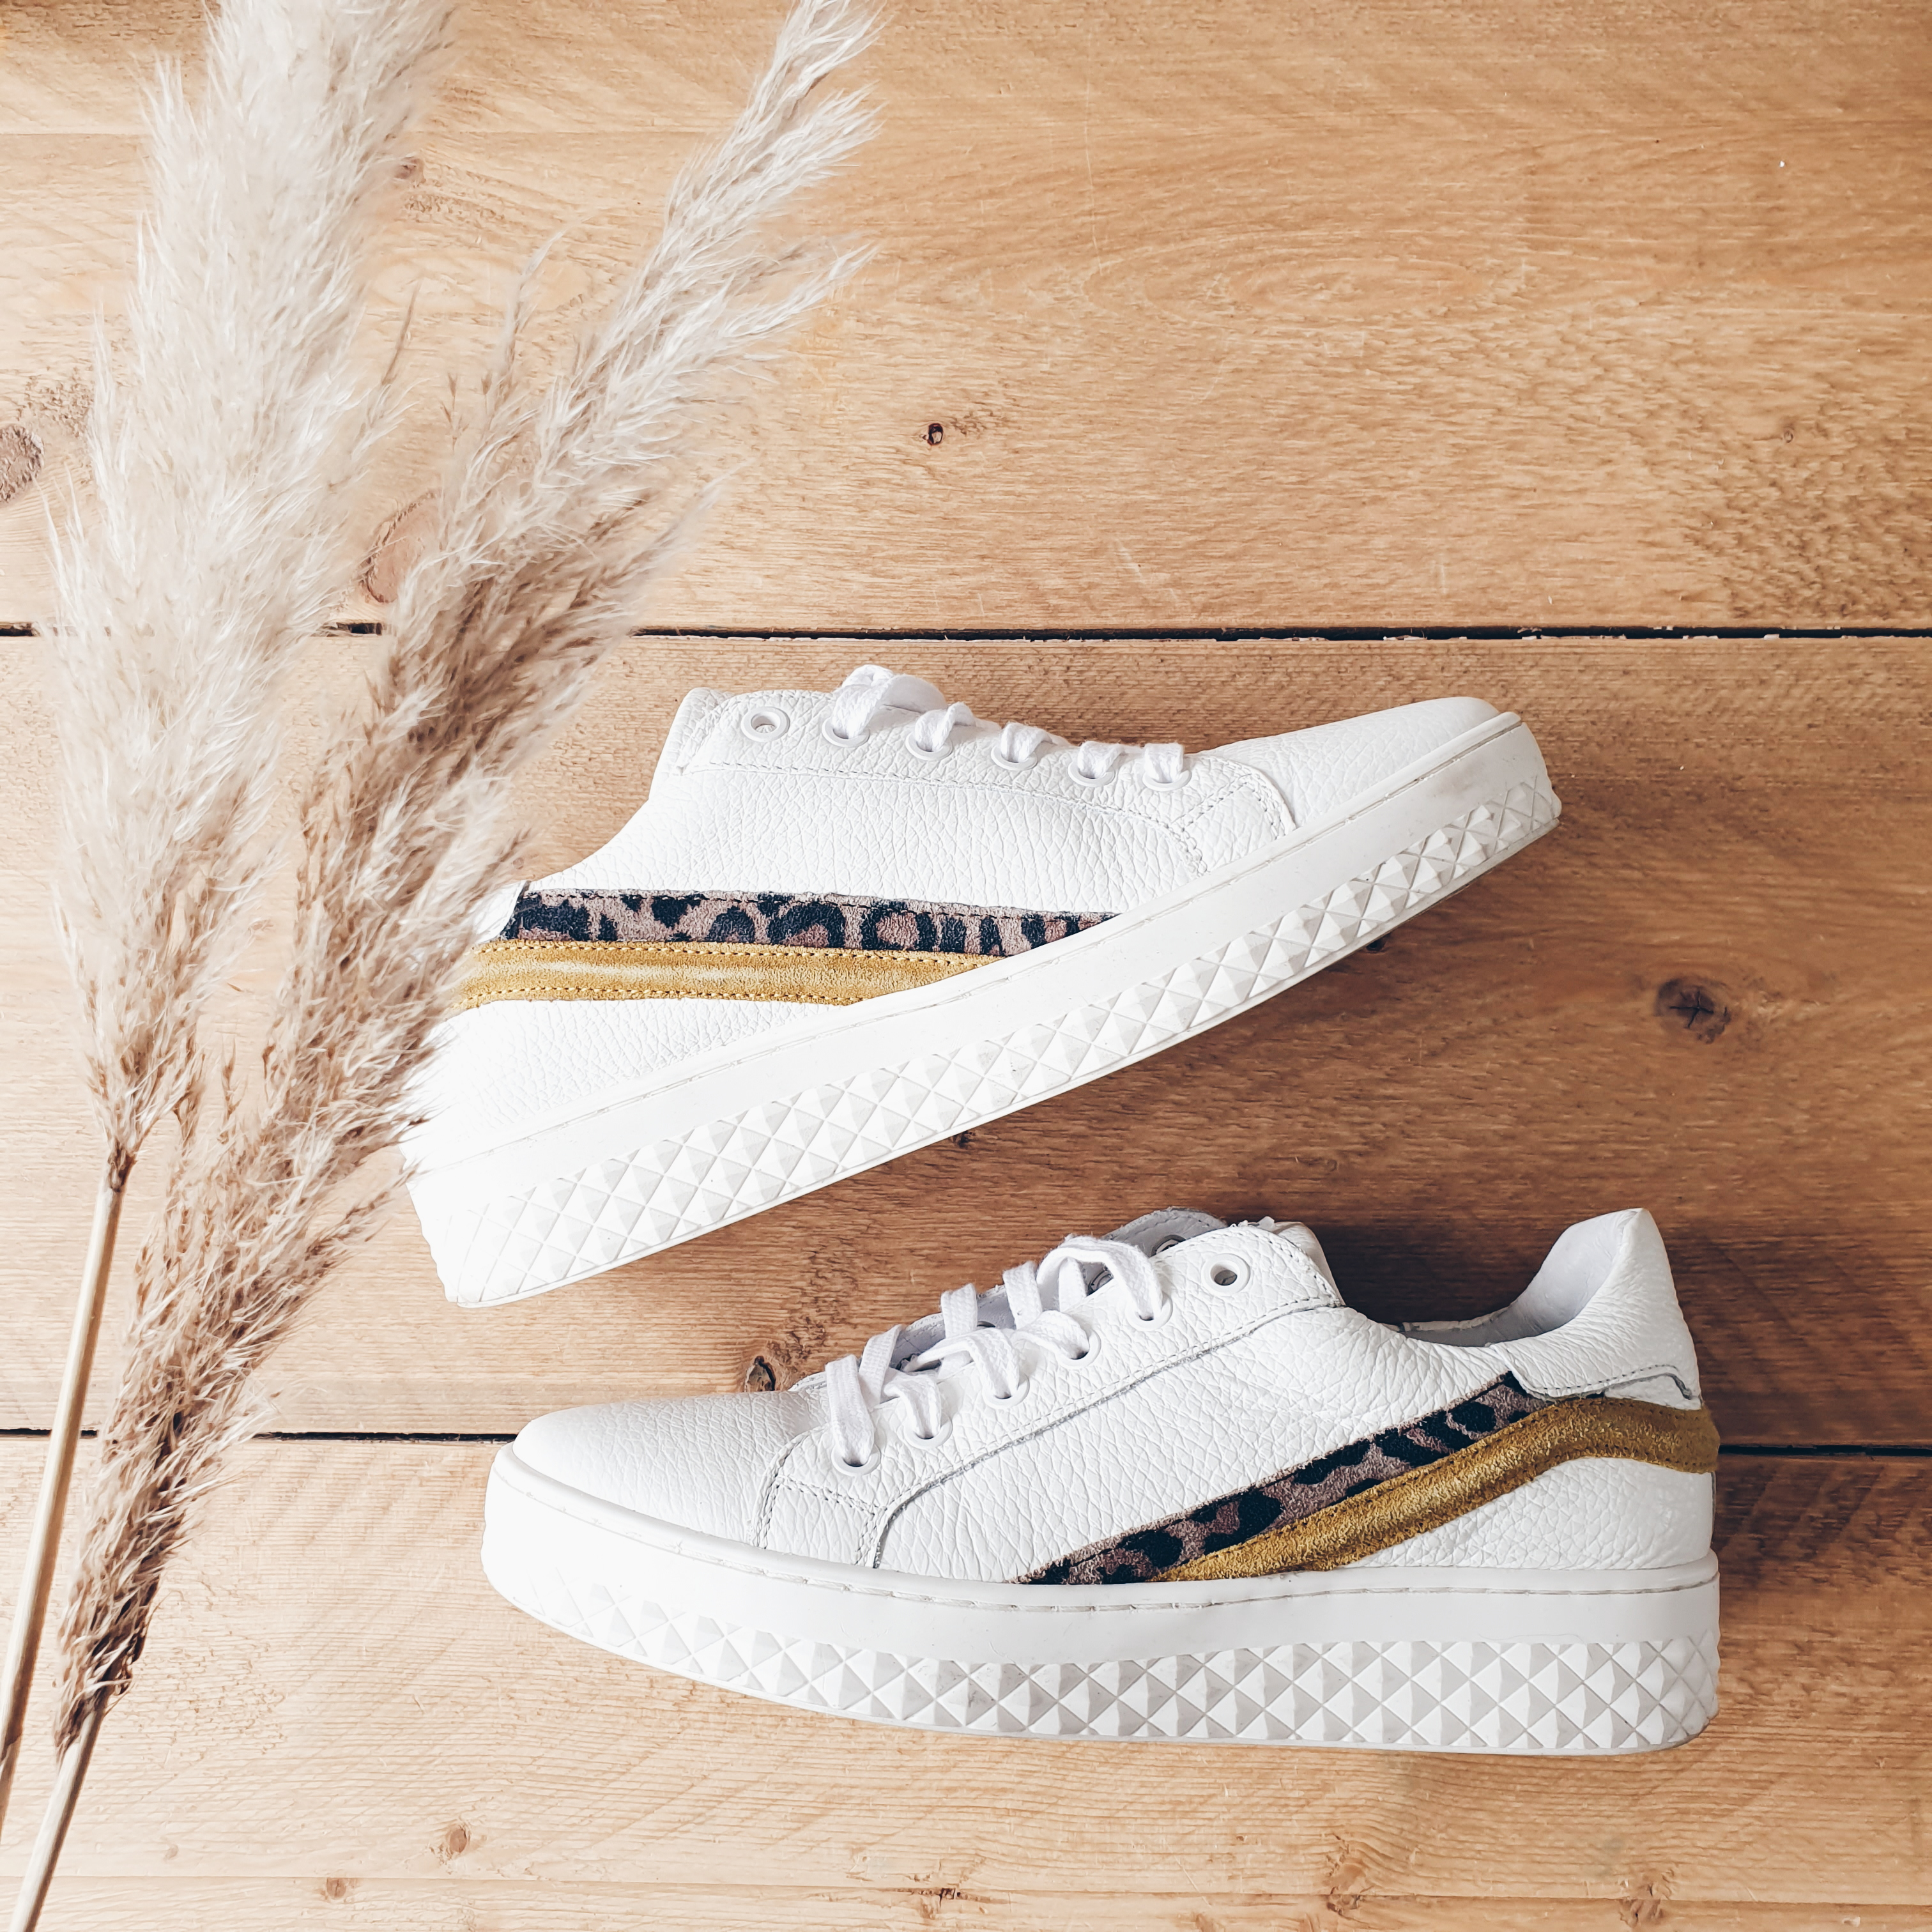 NEW IN – nieuwe sneakers van Sacha